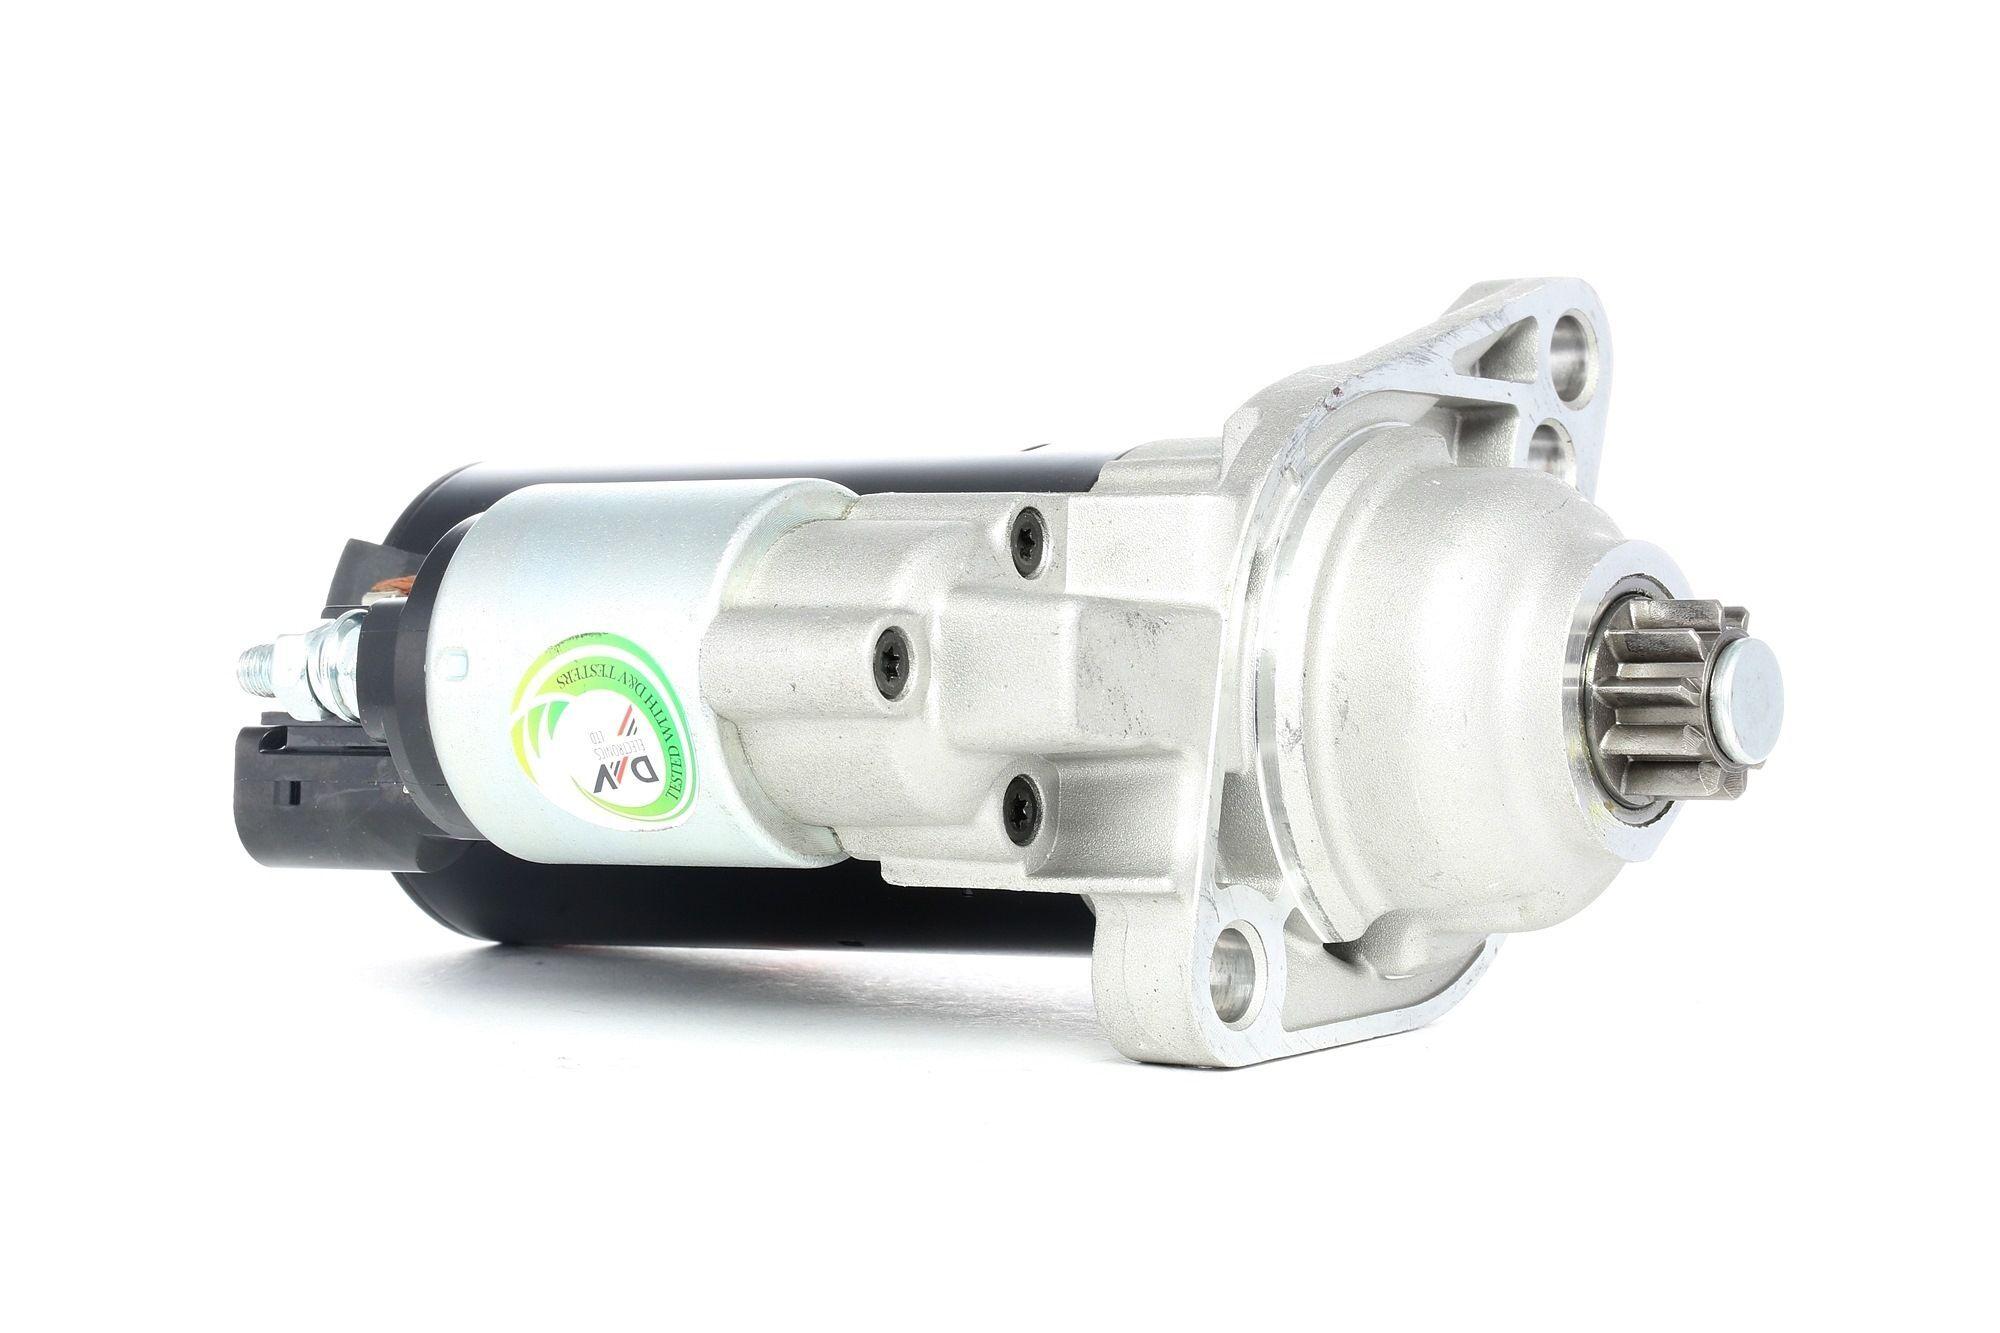 AS-PL Starttimoottori Brand new AS-PL Alternator 2542884 S0090 Startti,Käynnistinmoottori VW,AUDI,SKODA,GOLF IV 1J1,GOLF V 1K1,POLO 9N_